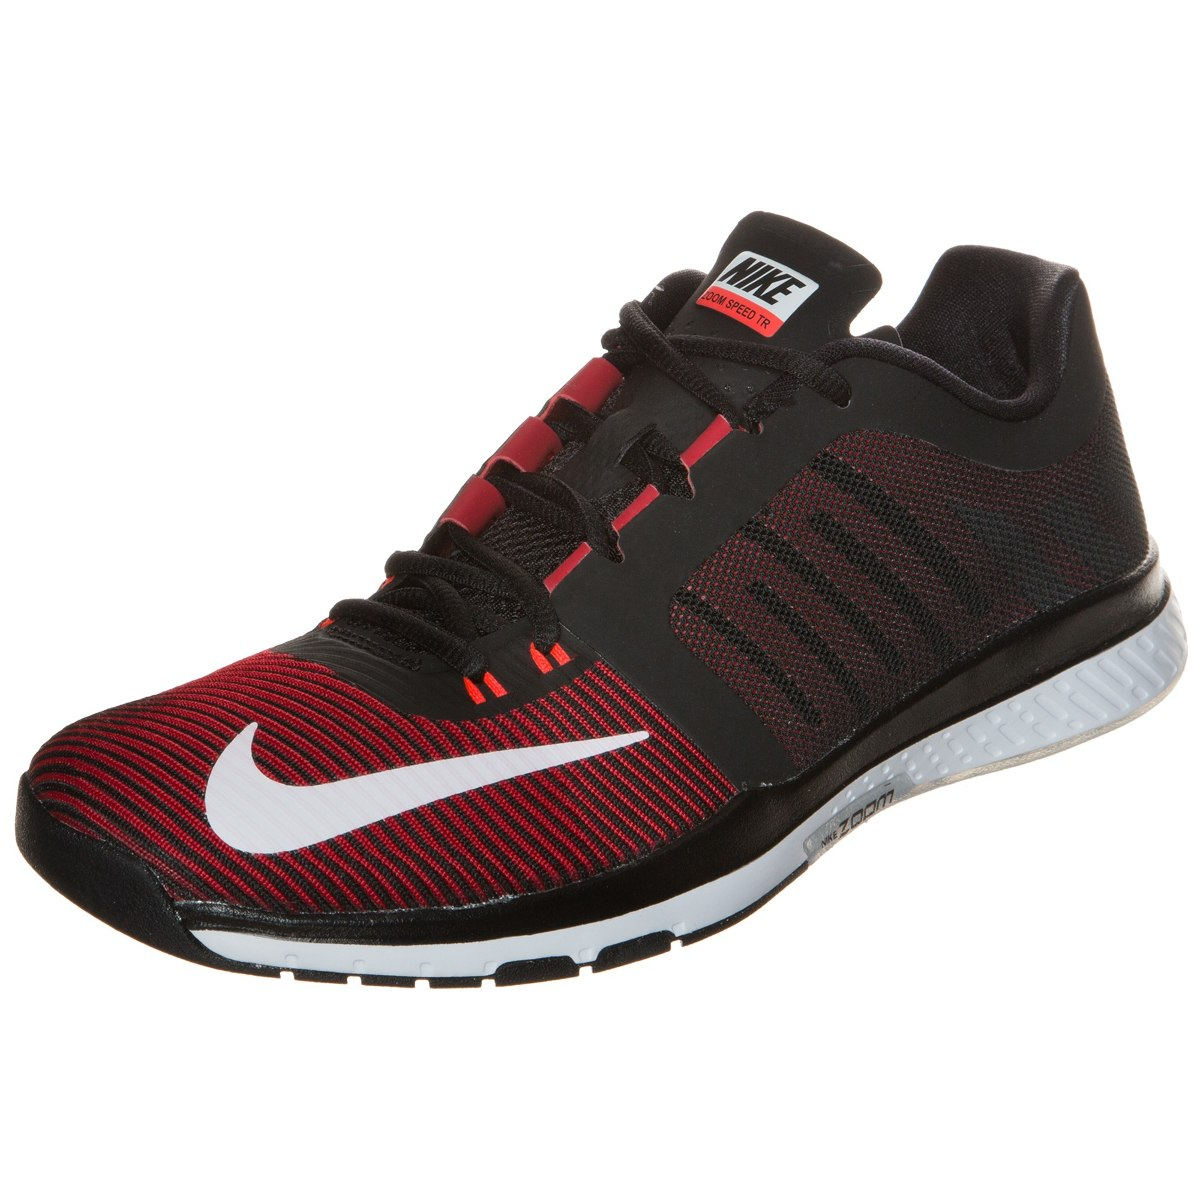 Zapatillas Tr3 Hombre Nike 804401 999 Crossfit Zoom 616 Speed 1 rqwPUxrv